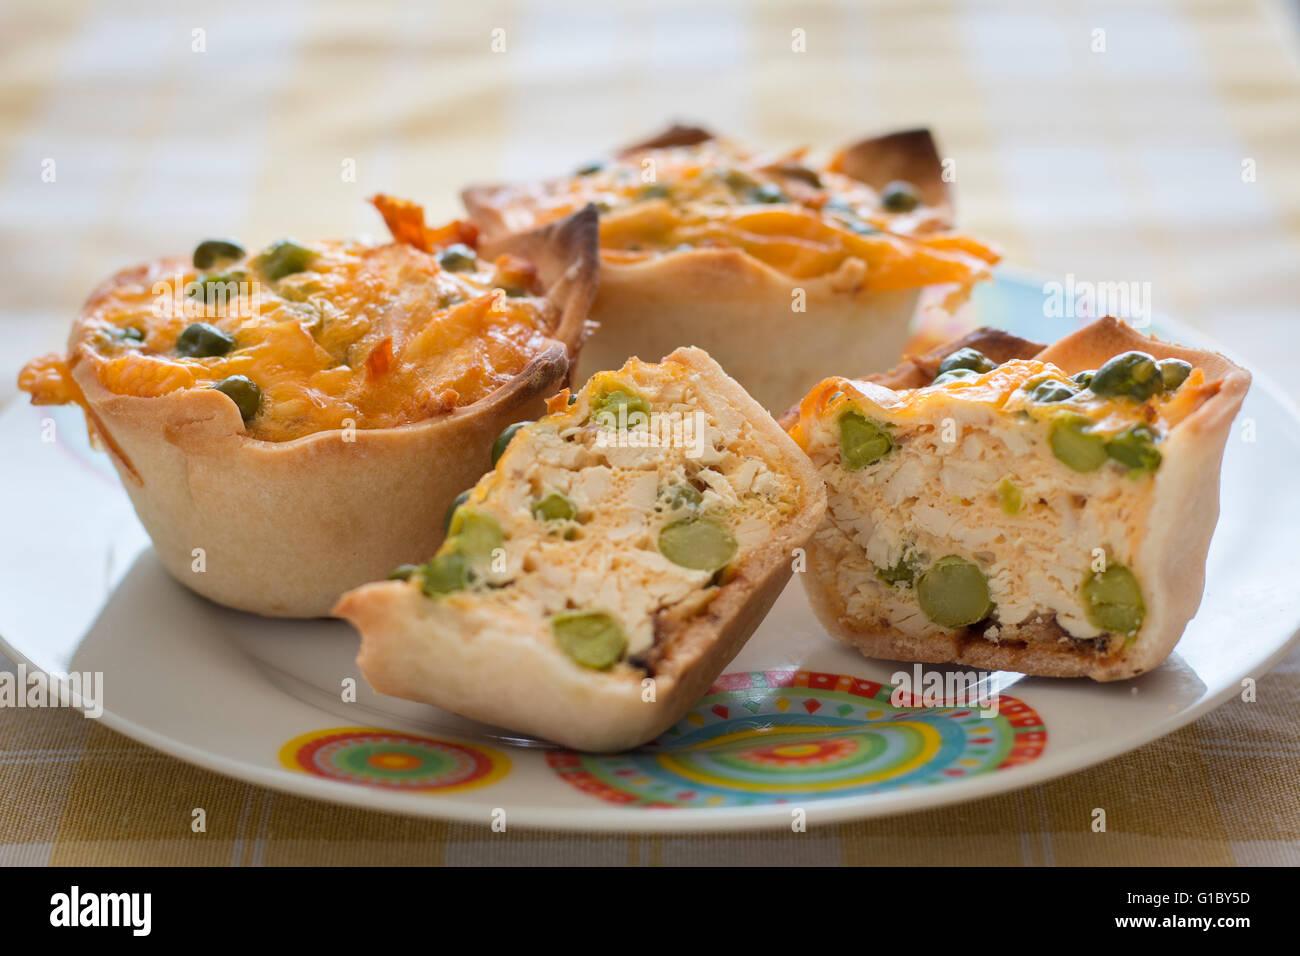 Gluten free chicken quiche with peas, food - Stock Image